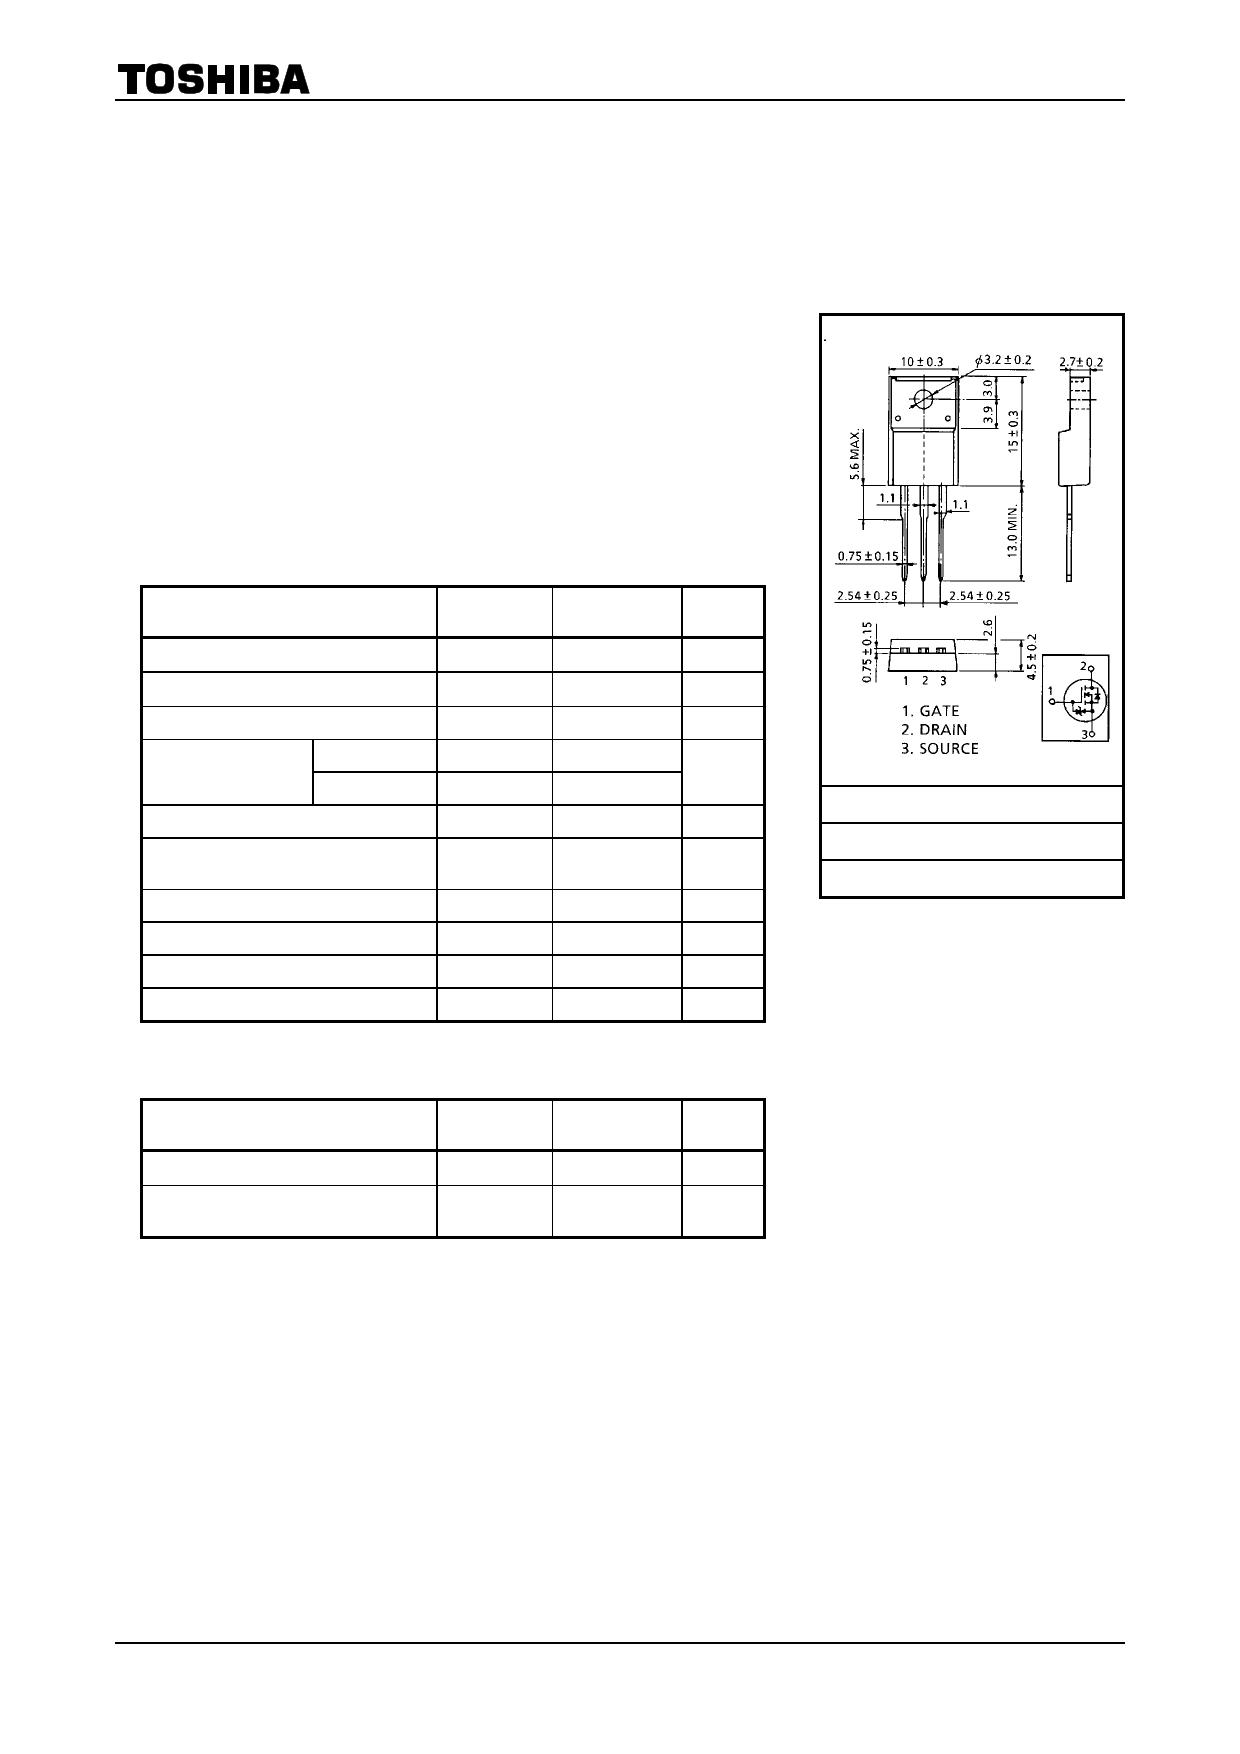 K2507 Datenblatt PDF